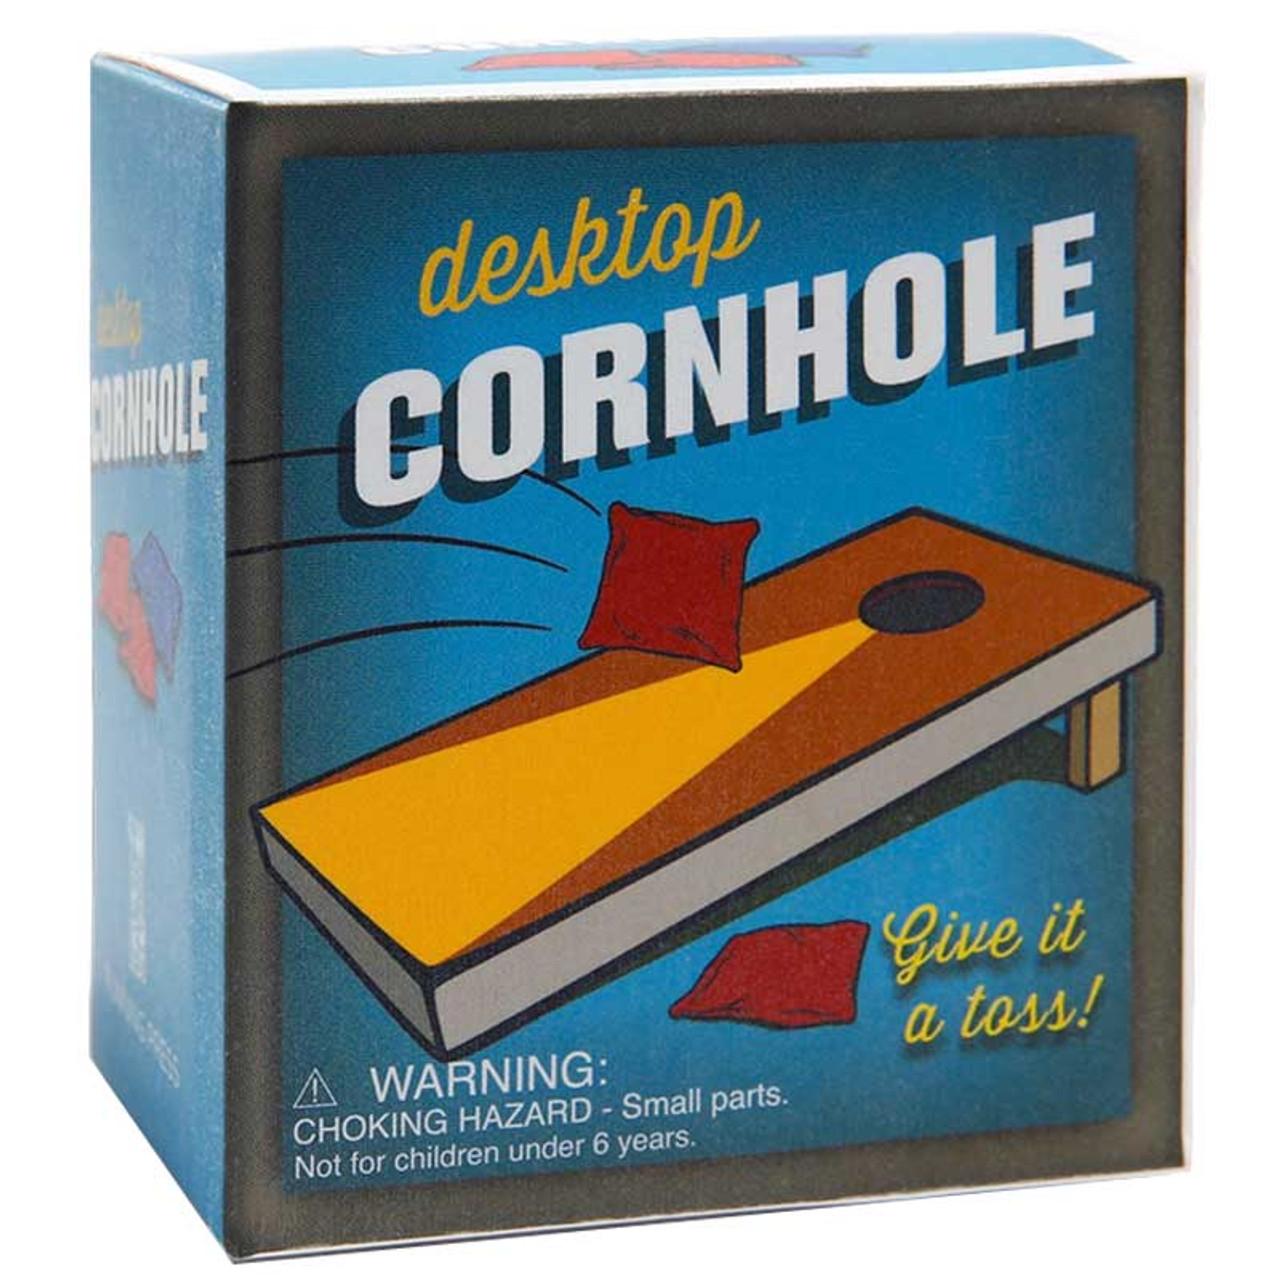 Cornhole for Work